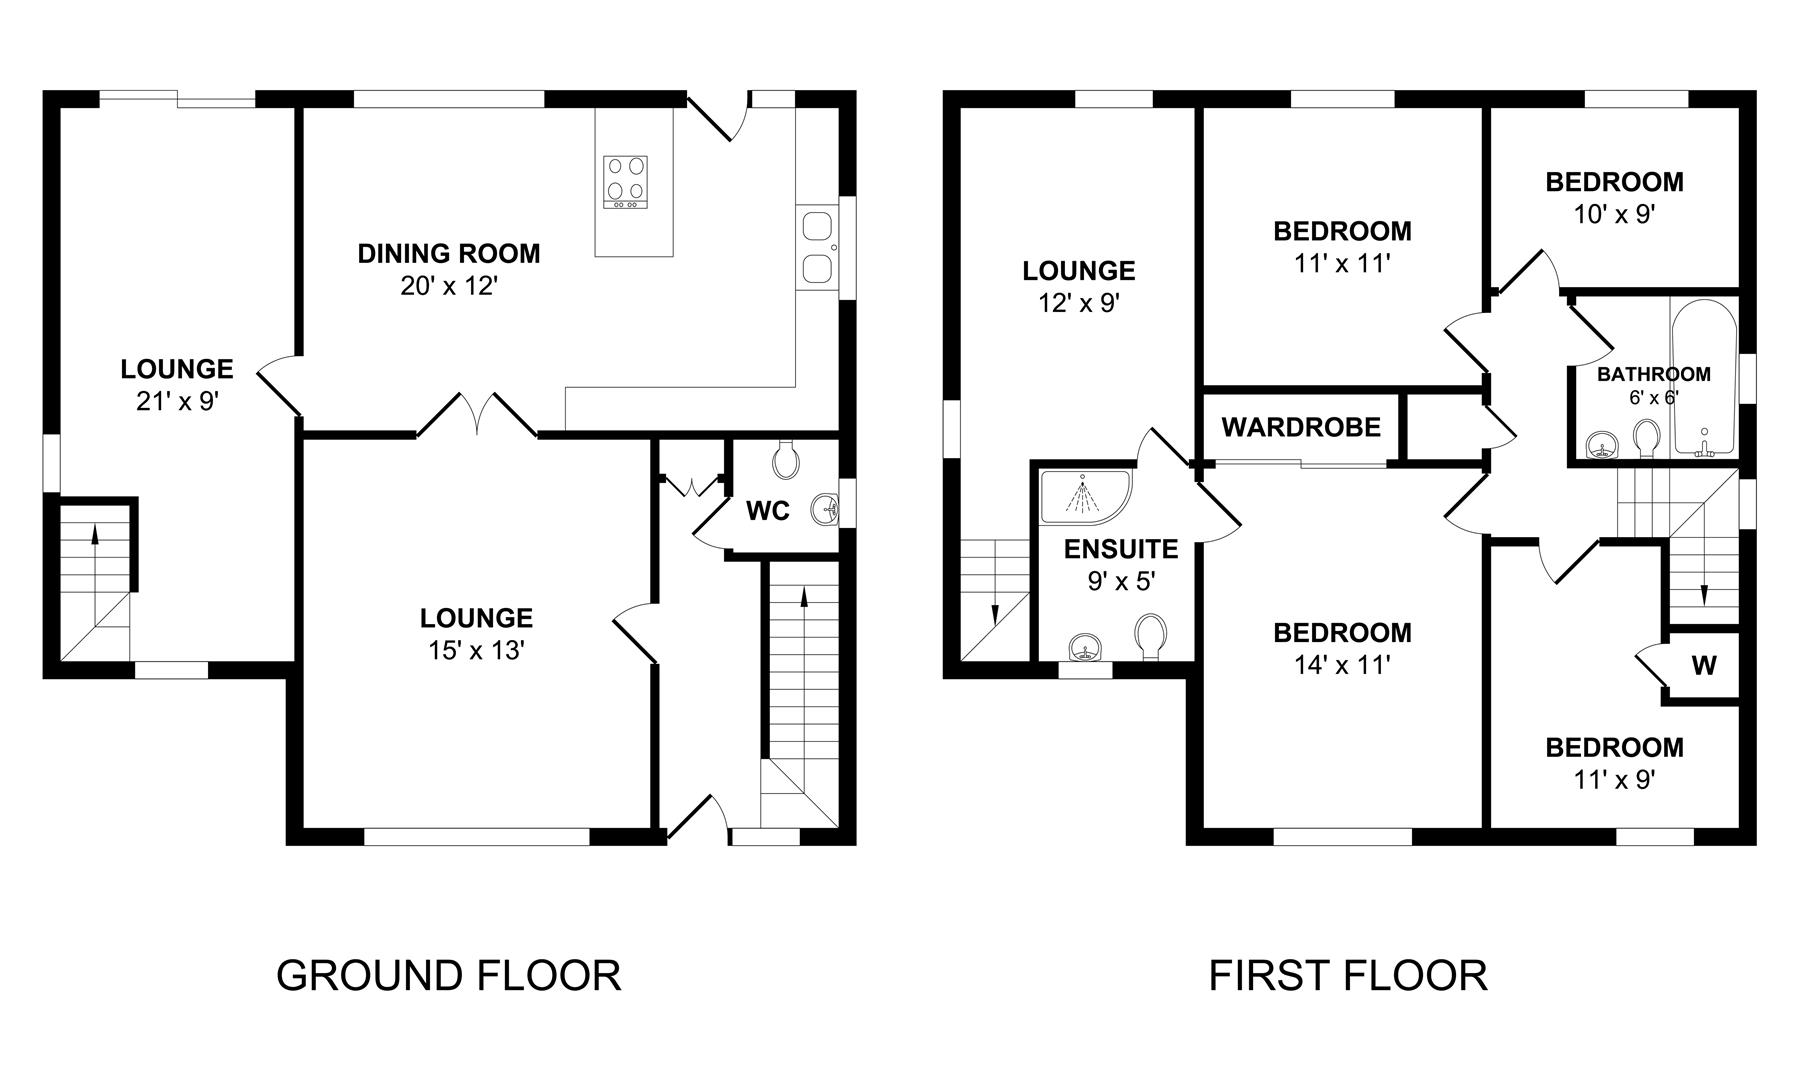 38 Rutland Close Floorplan.jpg